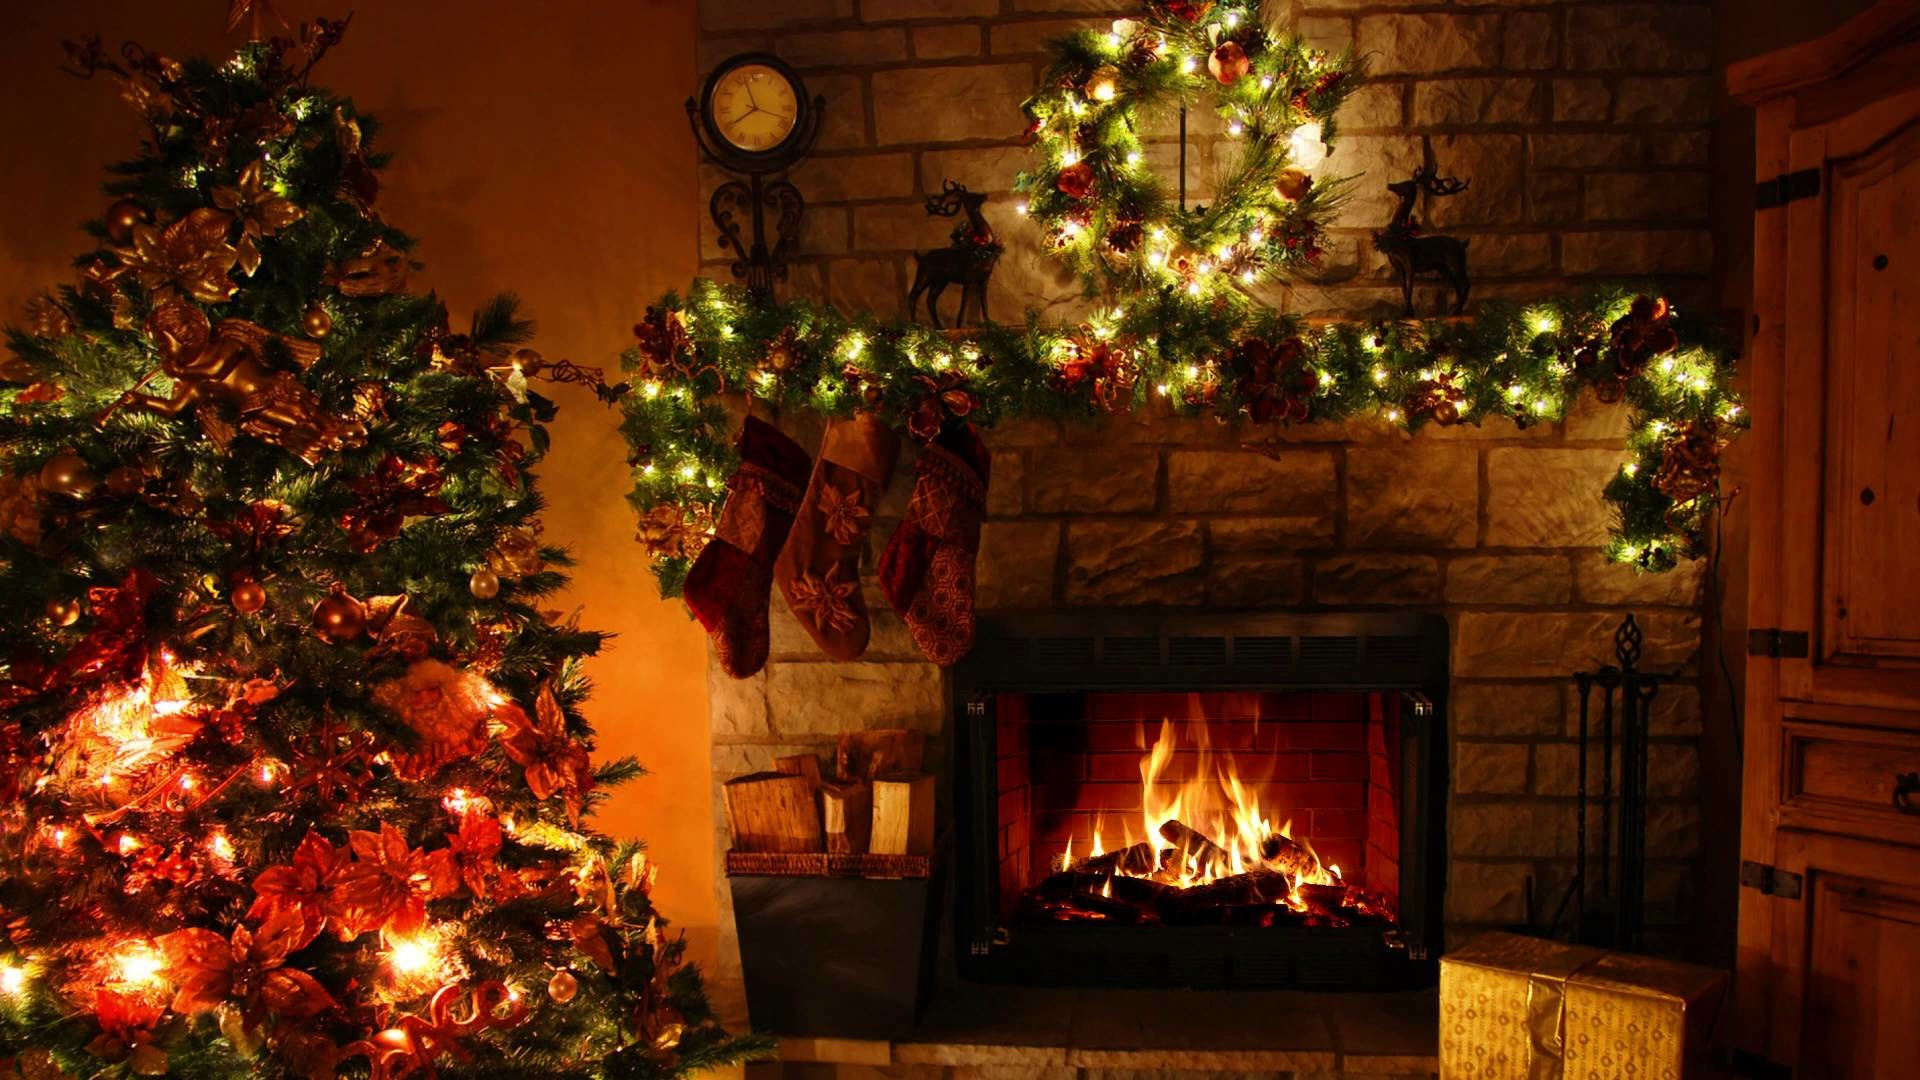 Christmas Wallpaper Fireplace  Christmas Fireplace Wallpaper ·① WallpaperTag